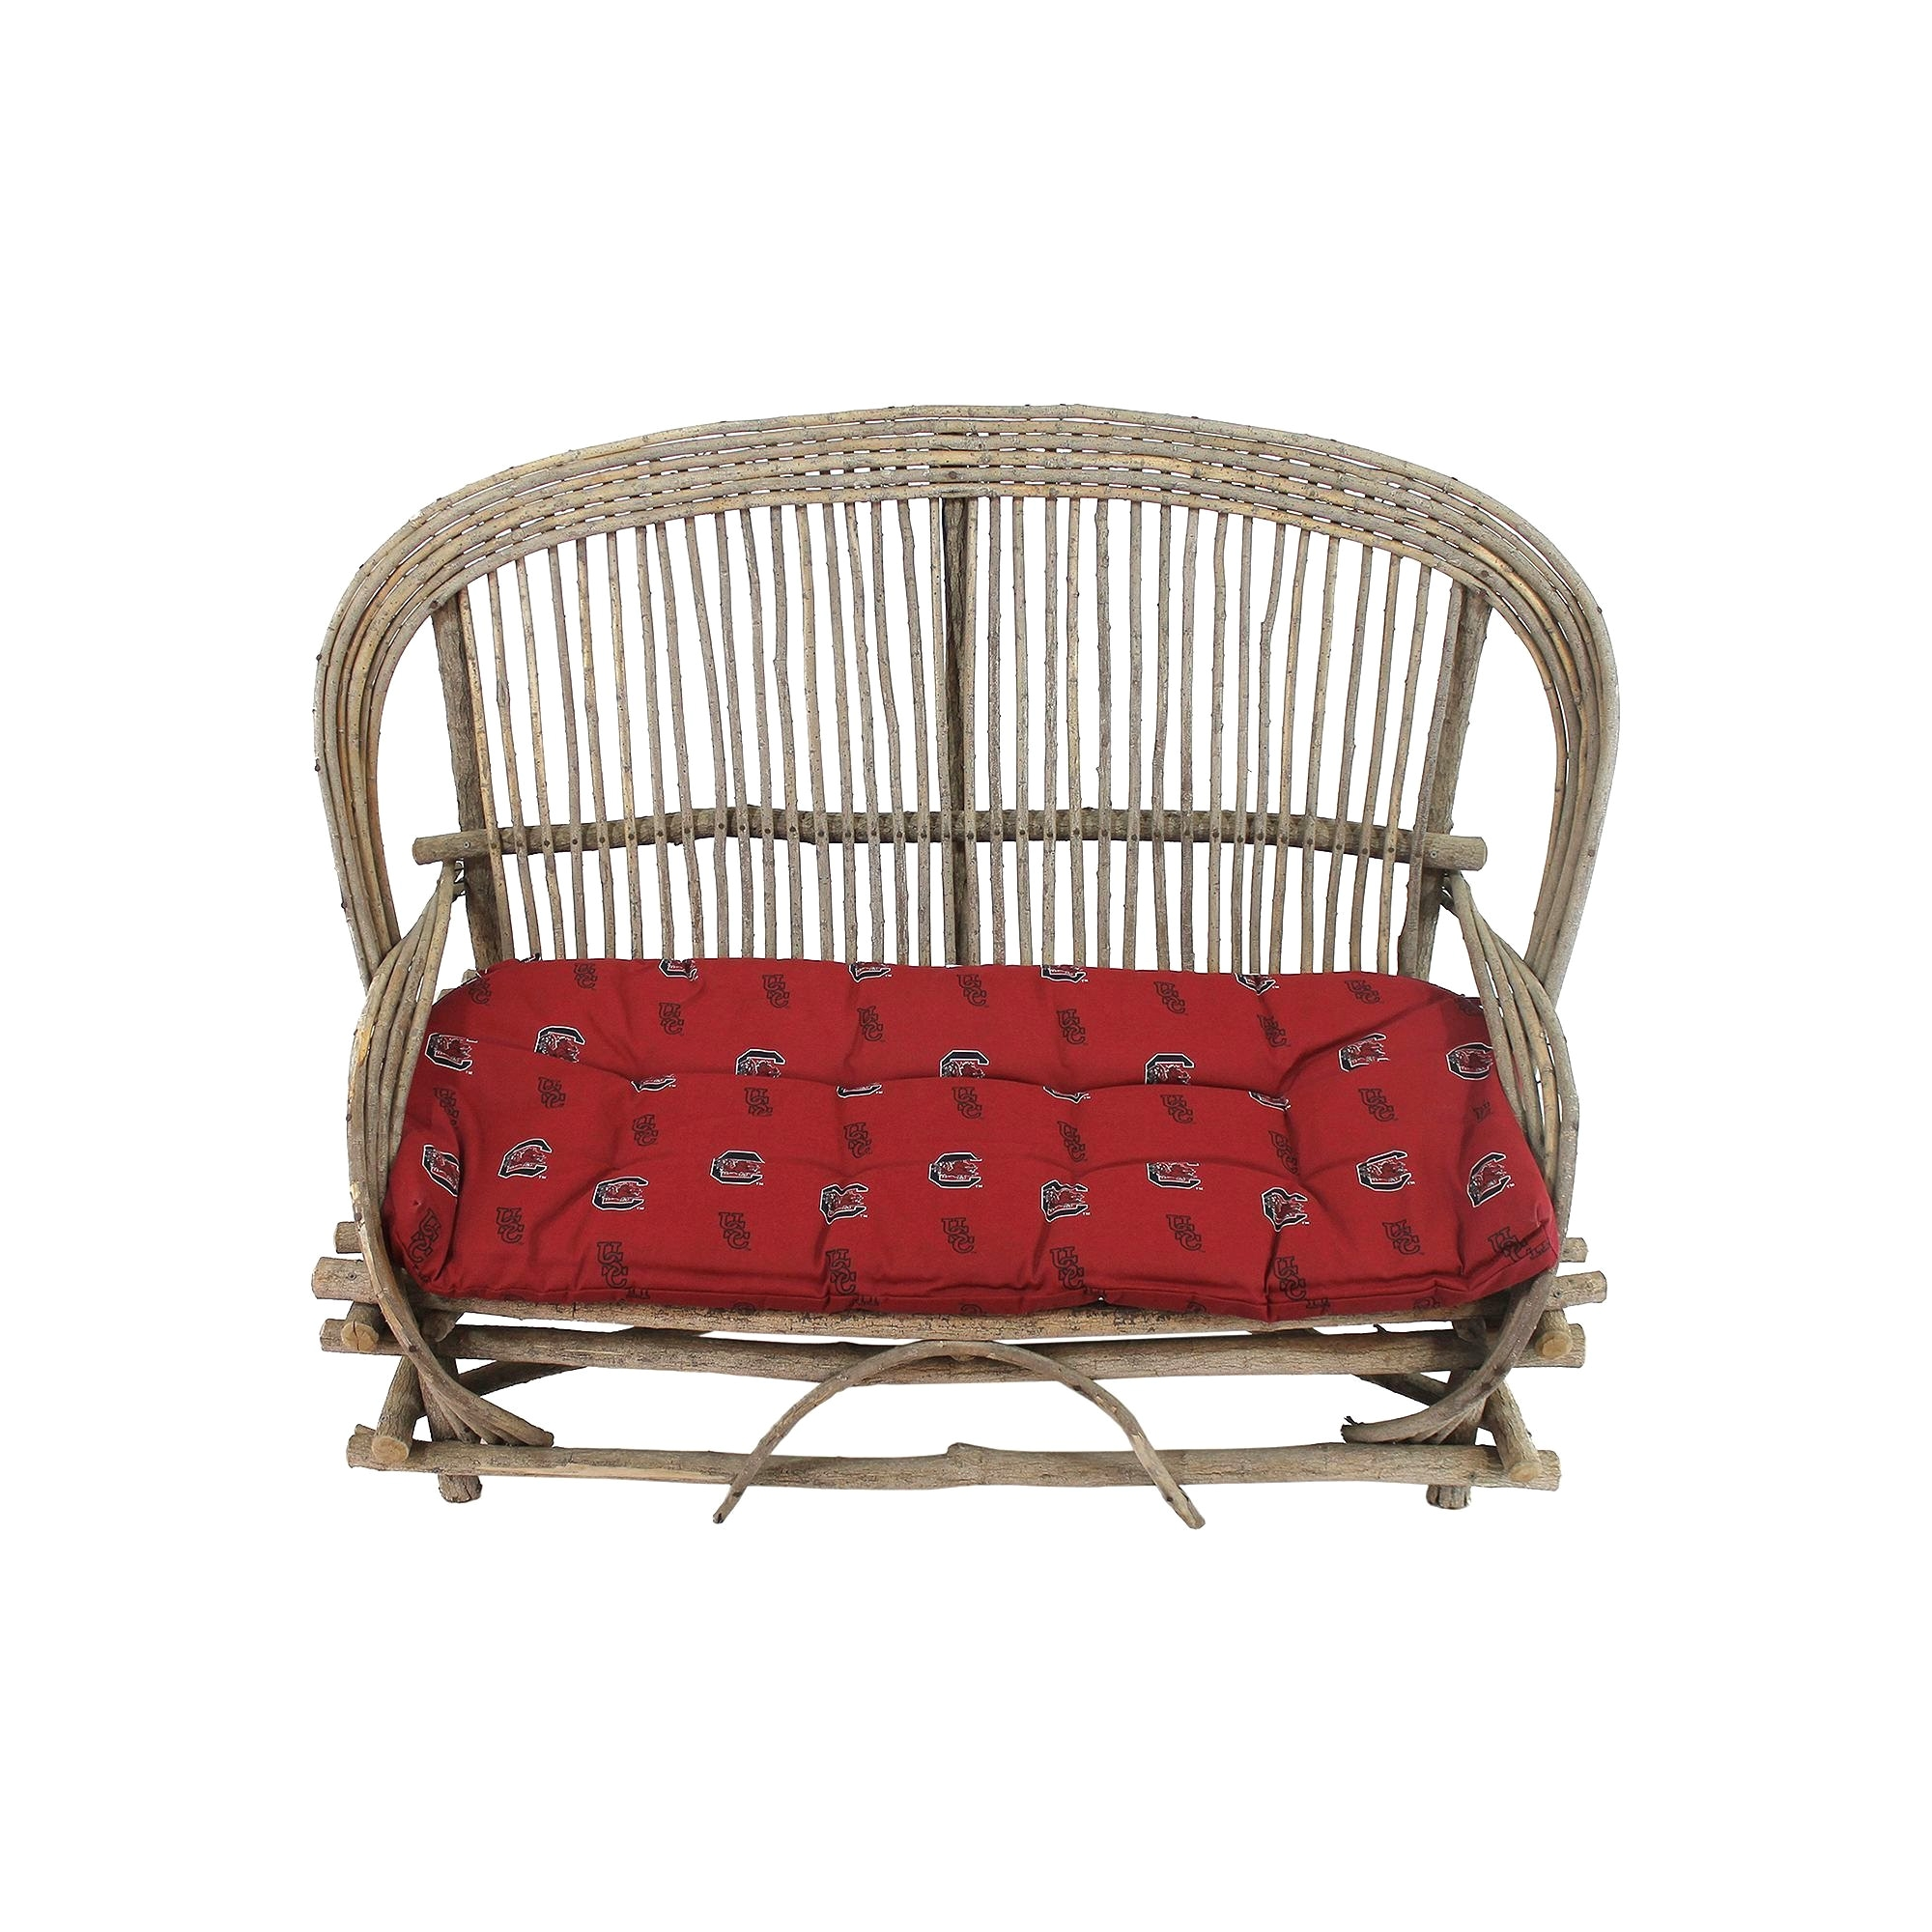 Kohls Rocking Chair Cushions Rocking Chair Cushions Kohls Beautiful 42 Fresh Rocking Chair